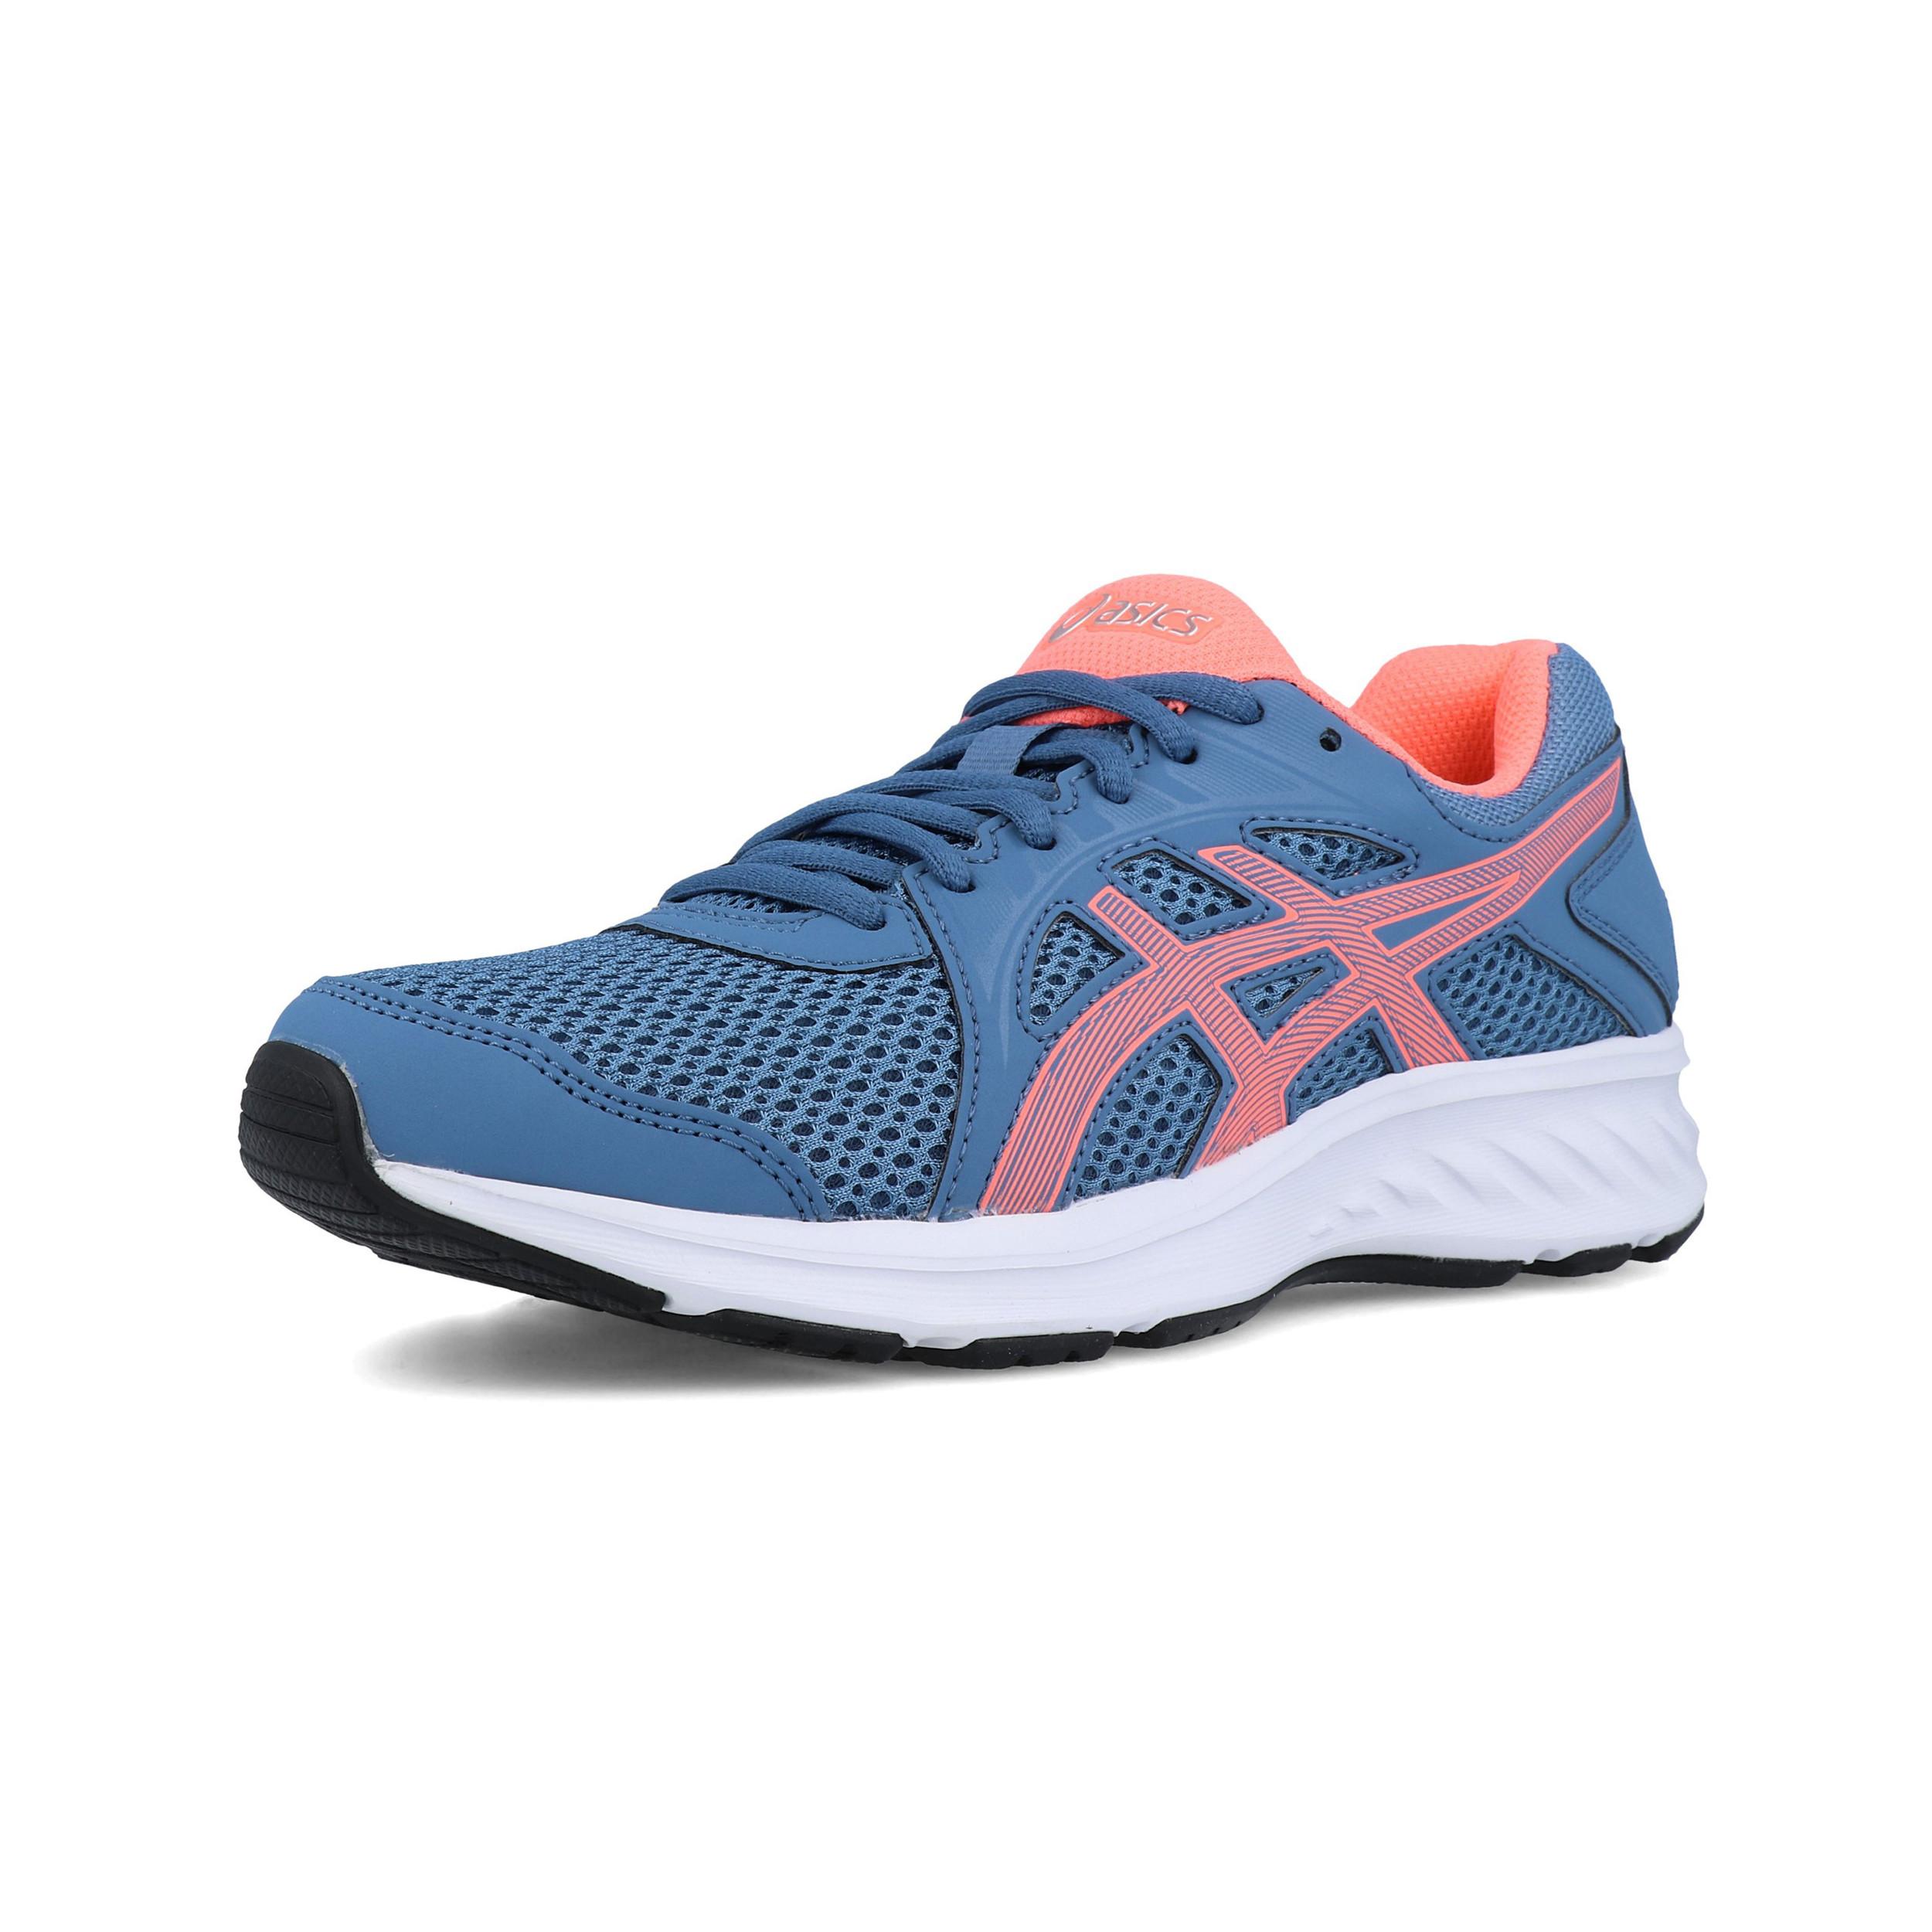 Running Asics   DynaFlyte 2 per donna scarpe da corsa Rosa